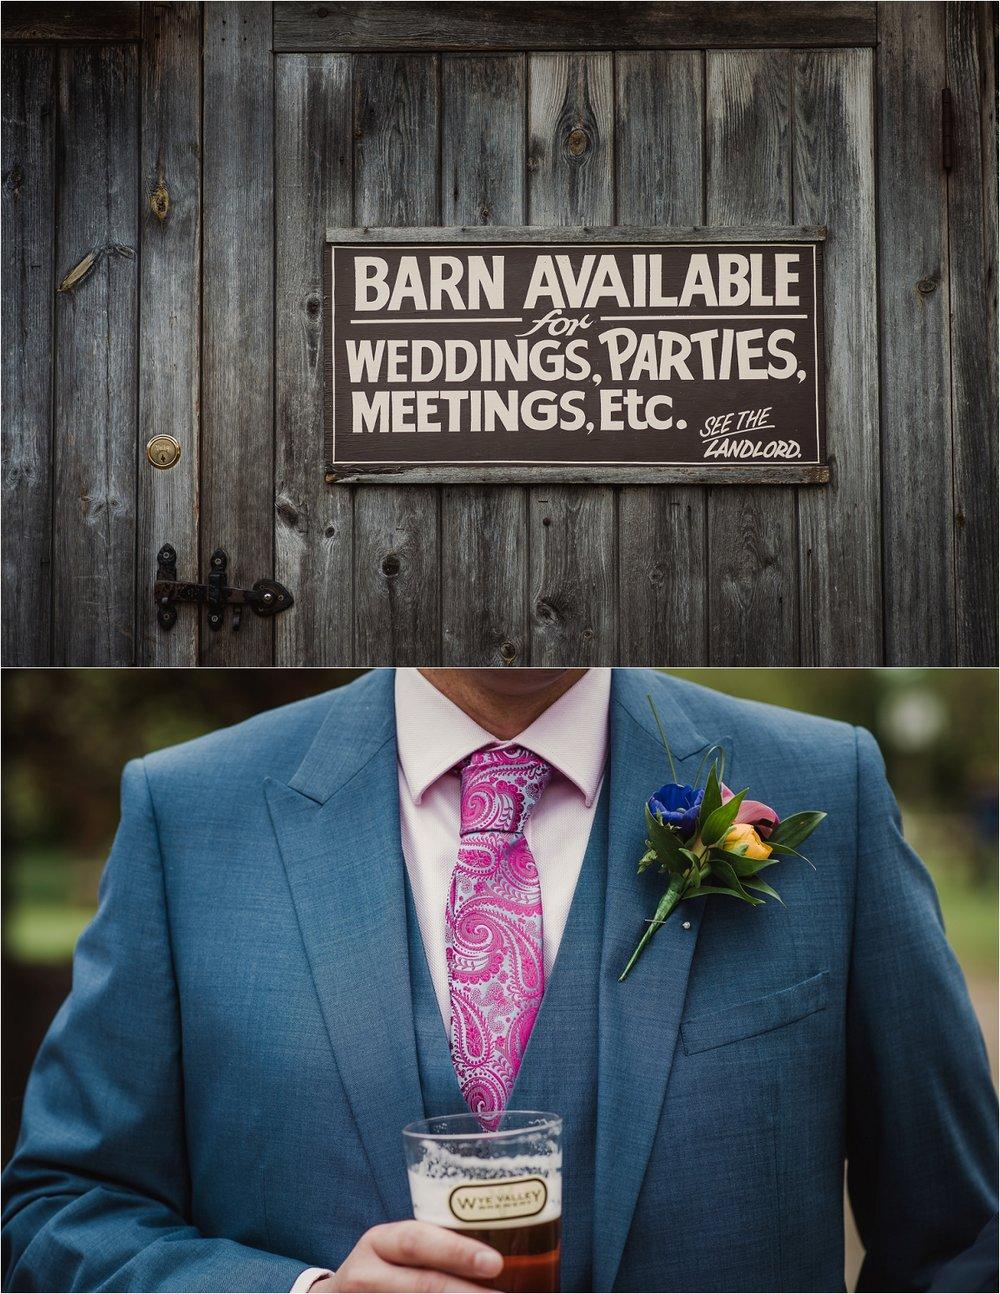 chris_emma_wedding_the_Fleece_inn_0022.jpg